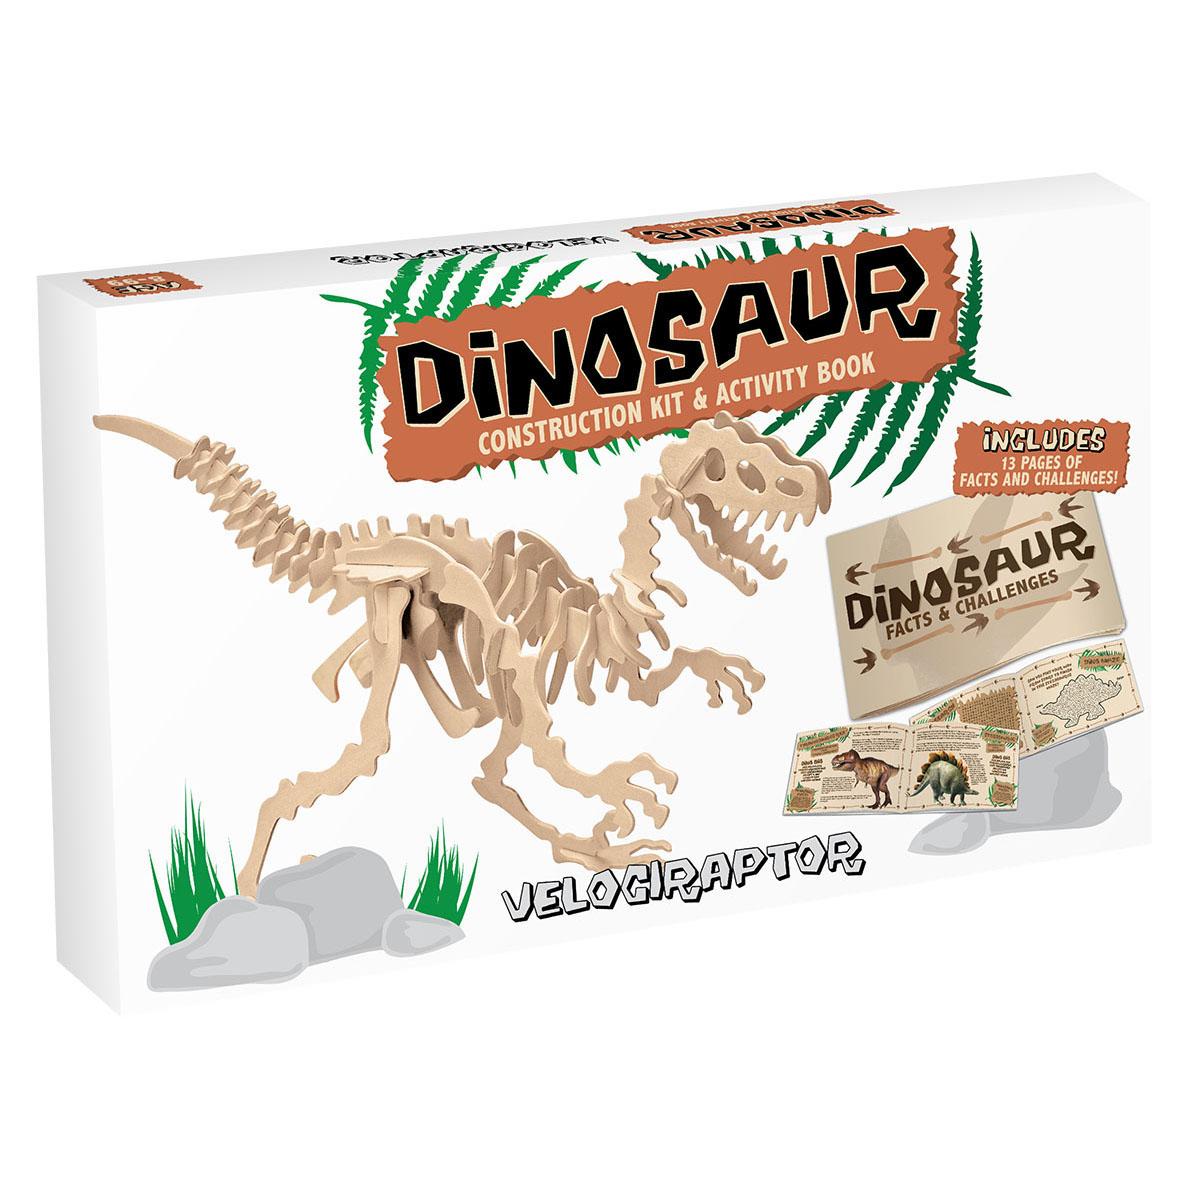 Dinosaur Construction Kit - Velociraptor